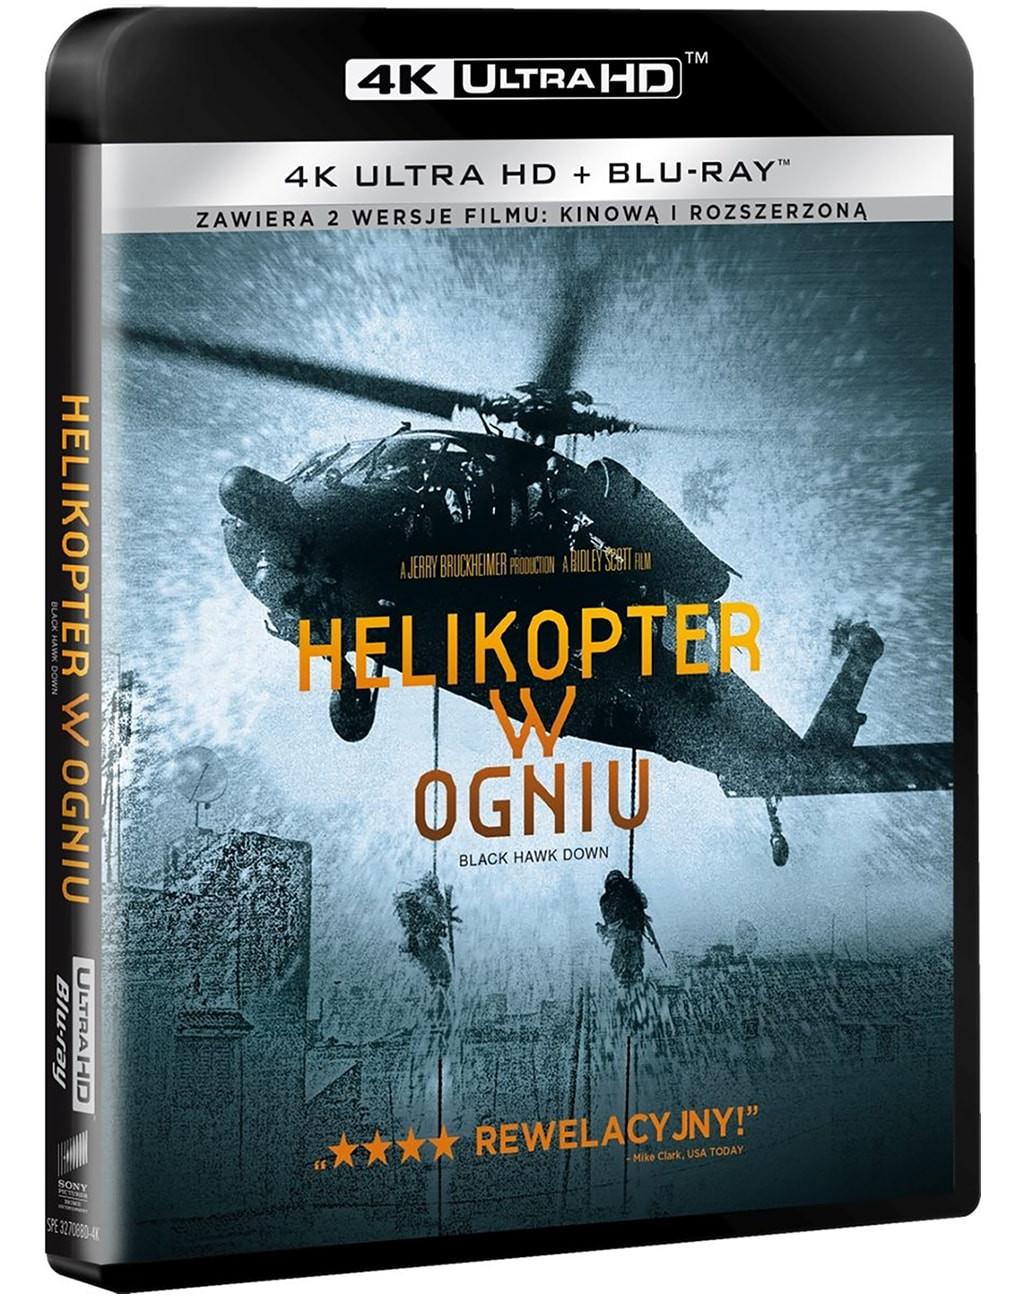 helikopter-w-ogniusli211-min.jpg